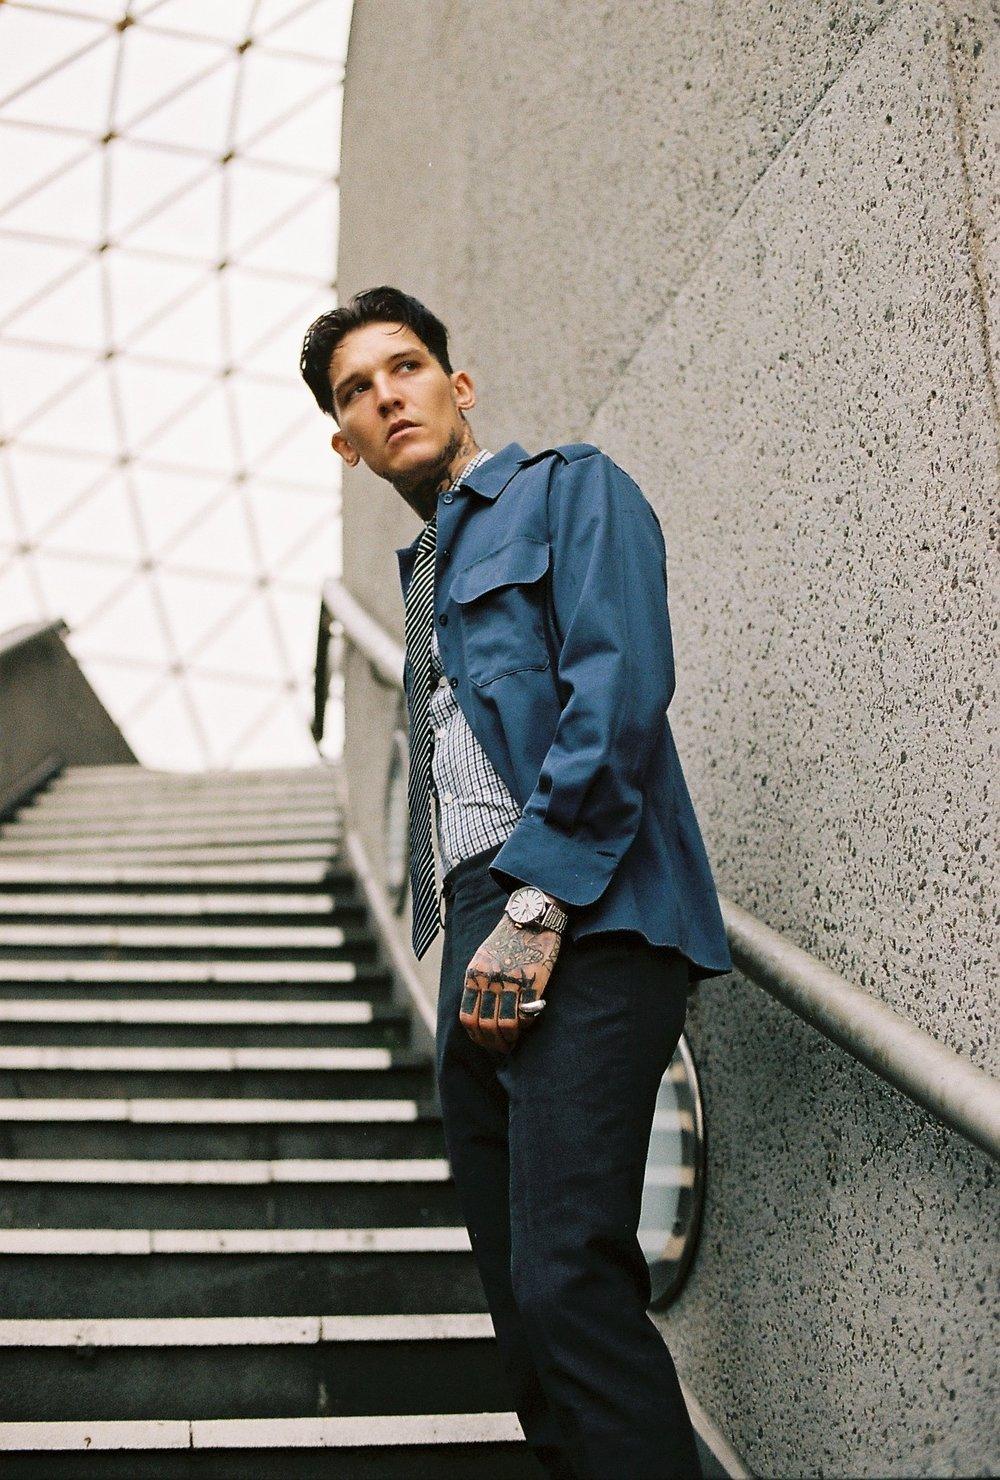 Jacket: Vintage find Shirt: @ ralphlauren  Pants & Tie @jacklondon watch: @ nixon  Ring @ tokyohumanexperiments